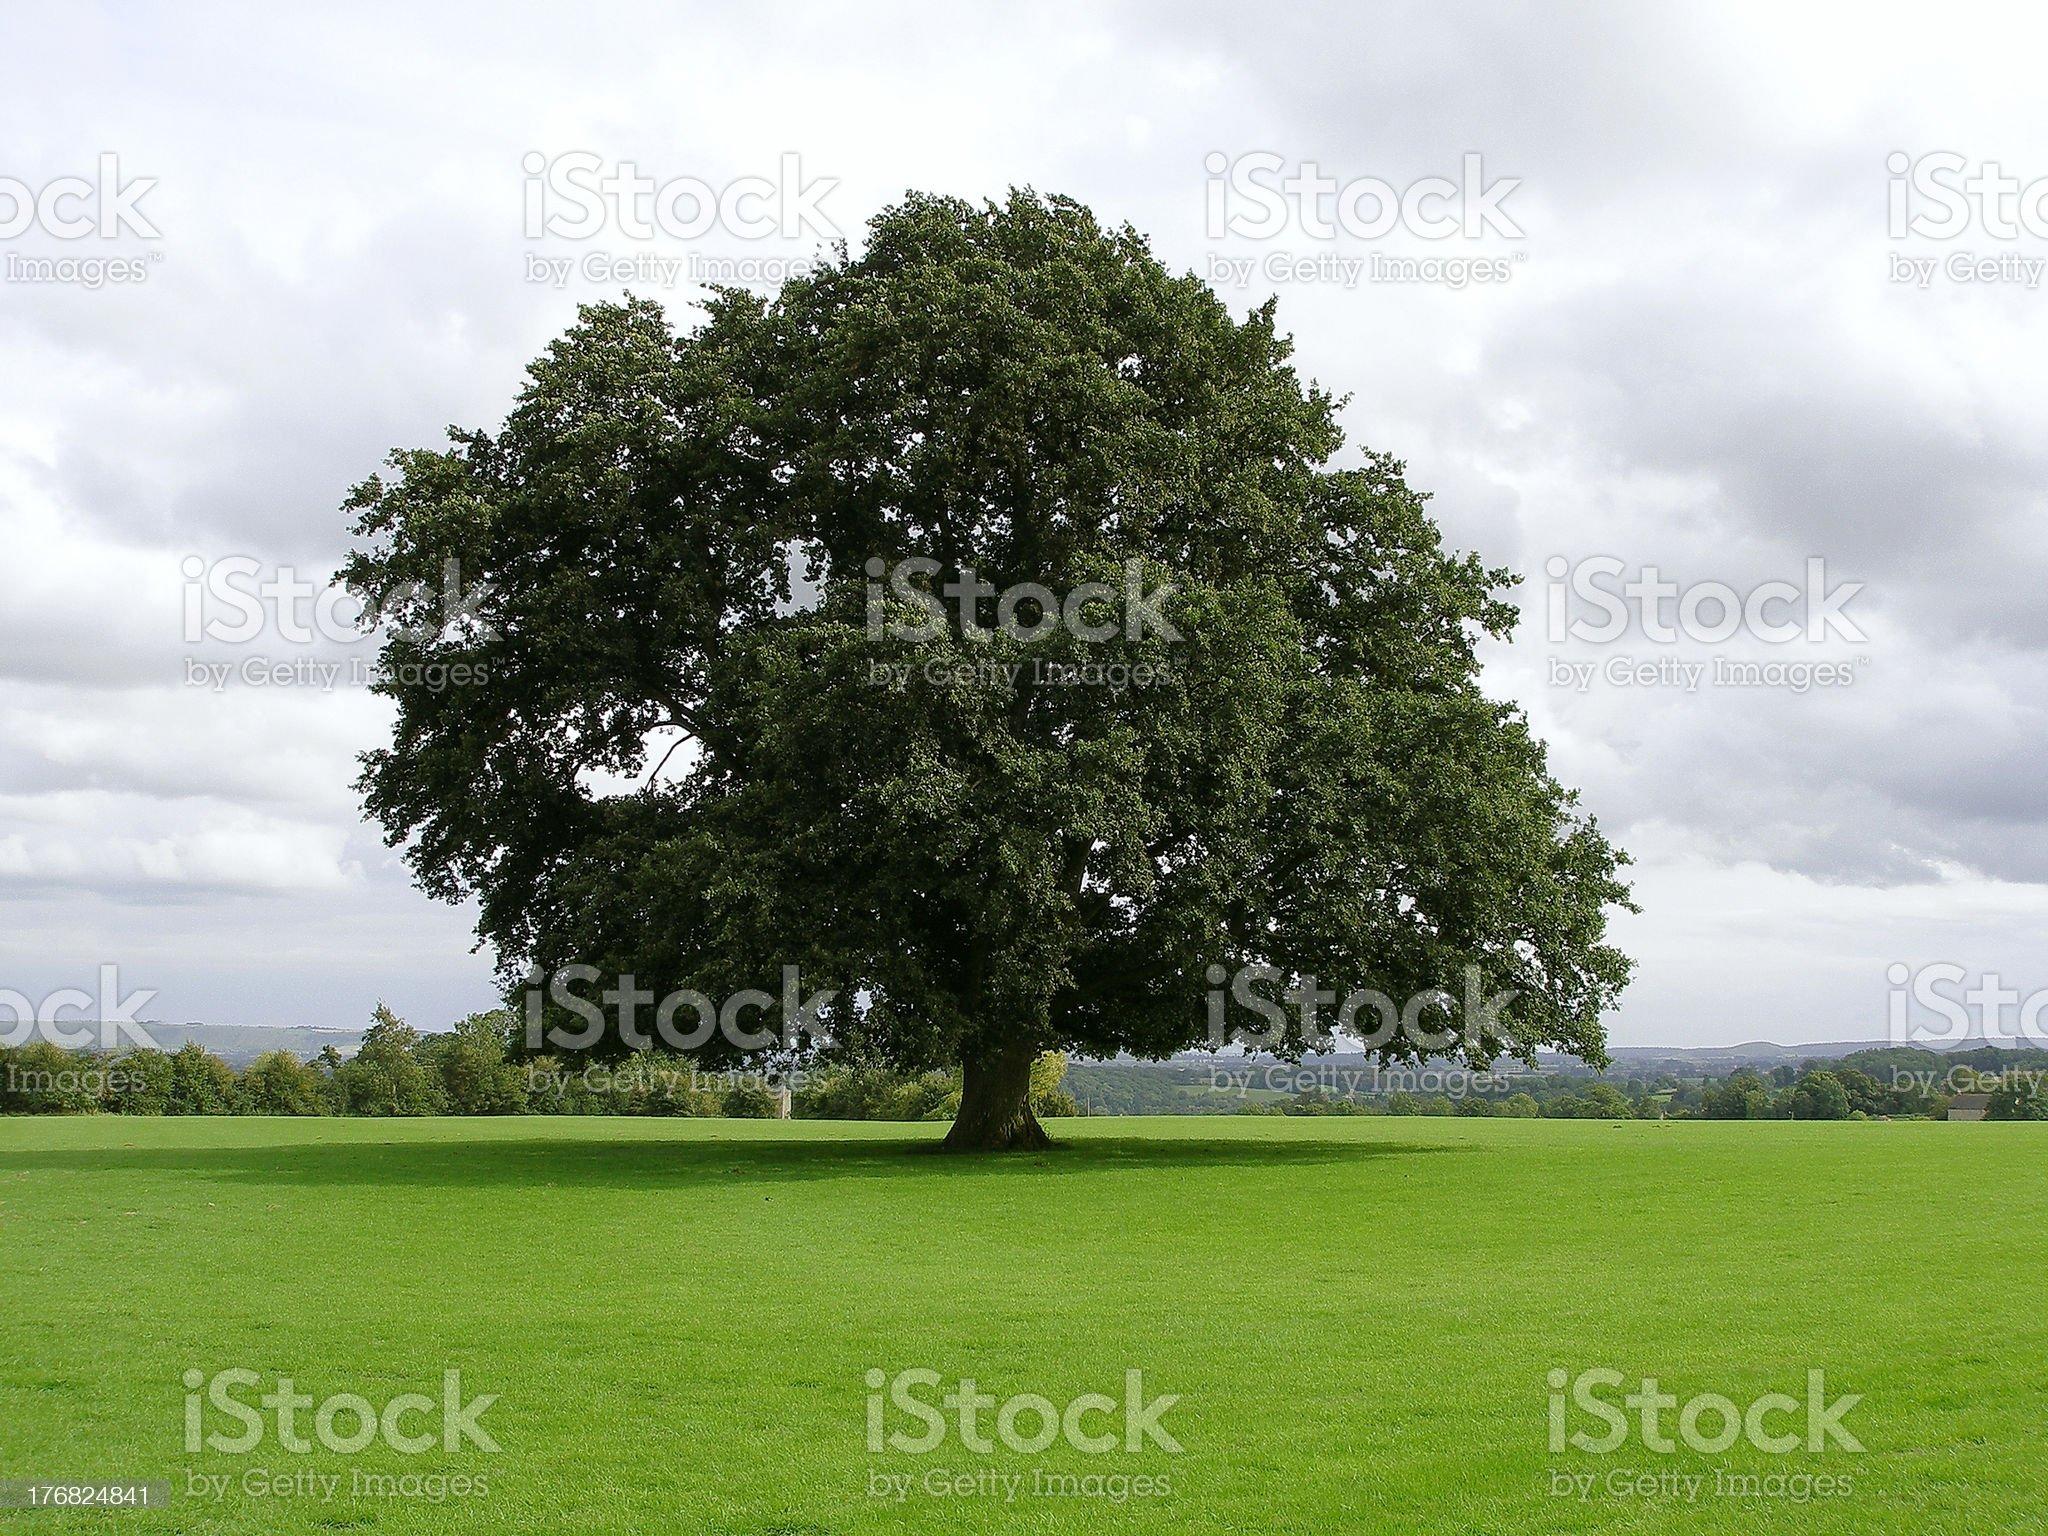 Oak Tree on a Lawn royalty-free stock photo